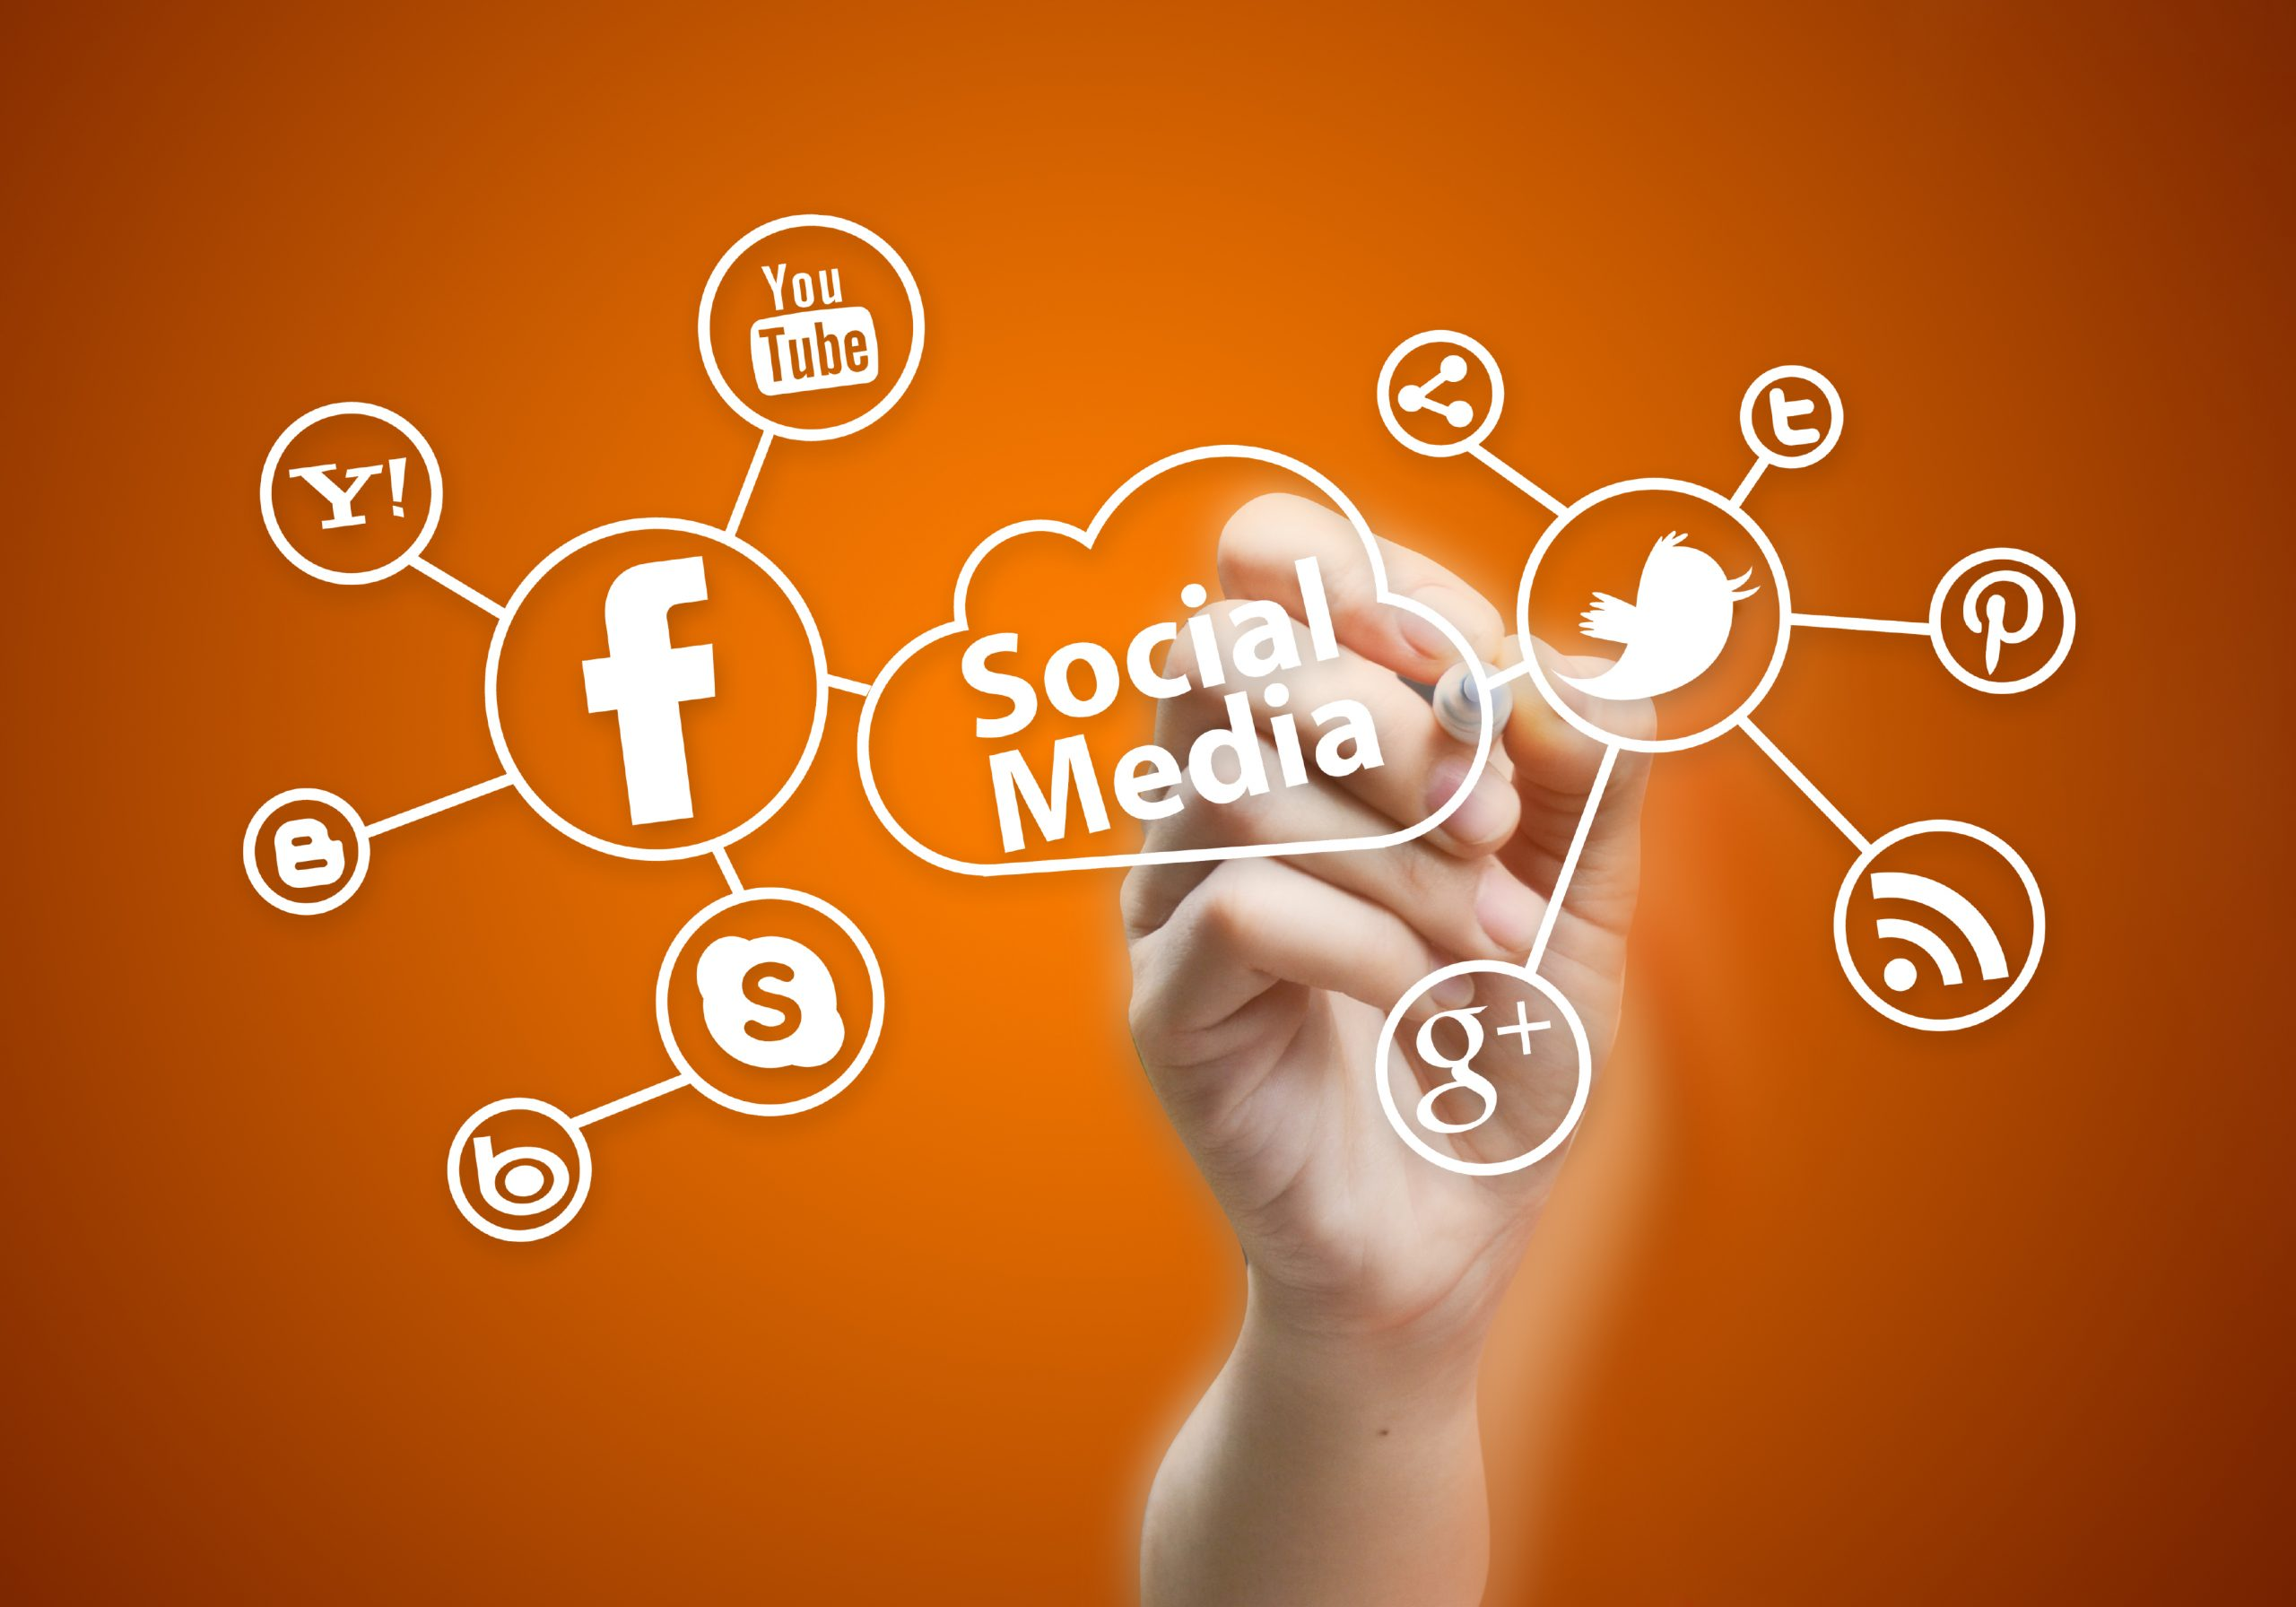 Social Media Linking With Oculu